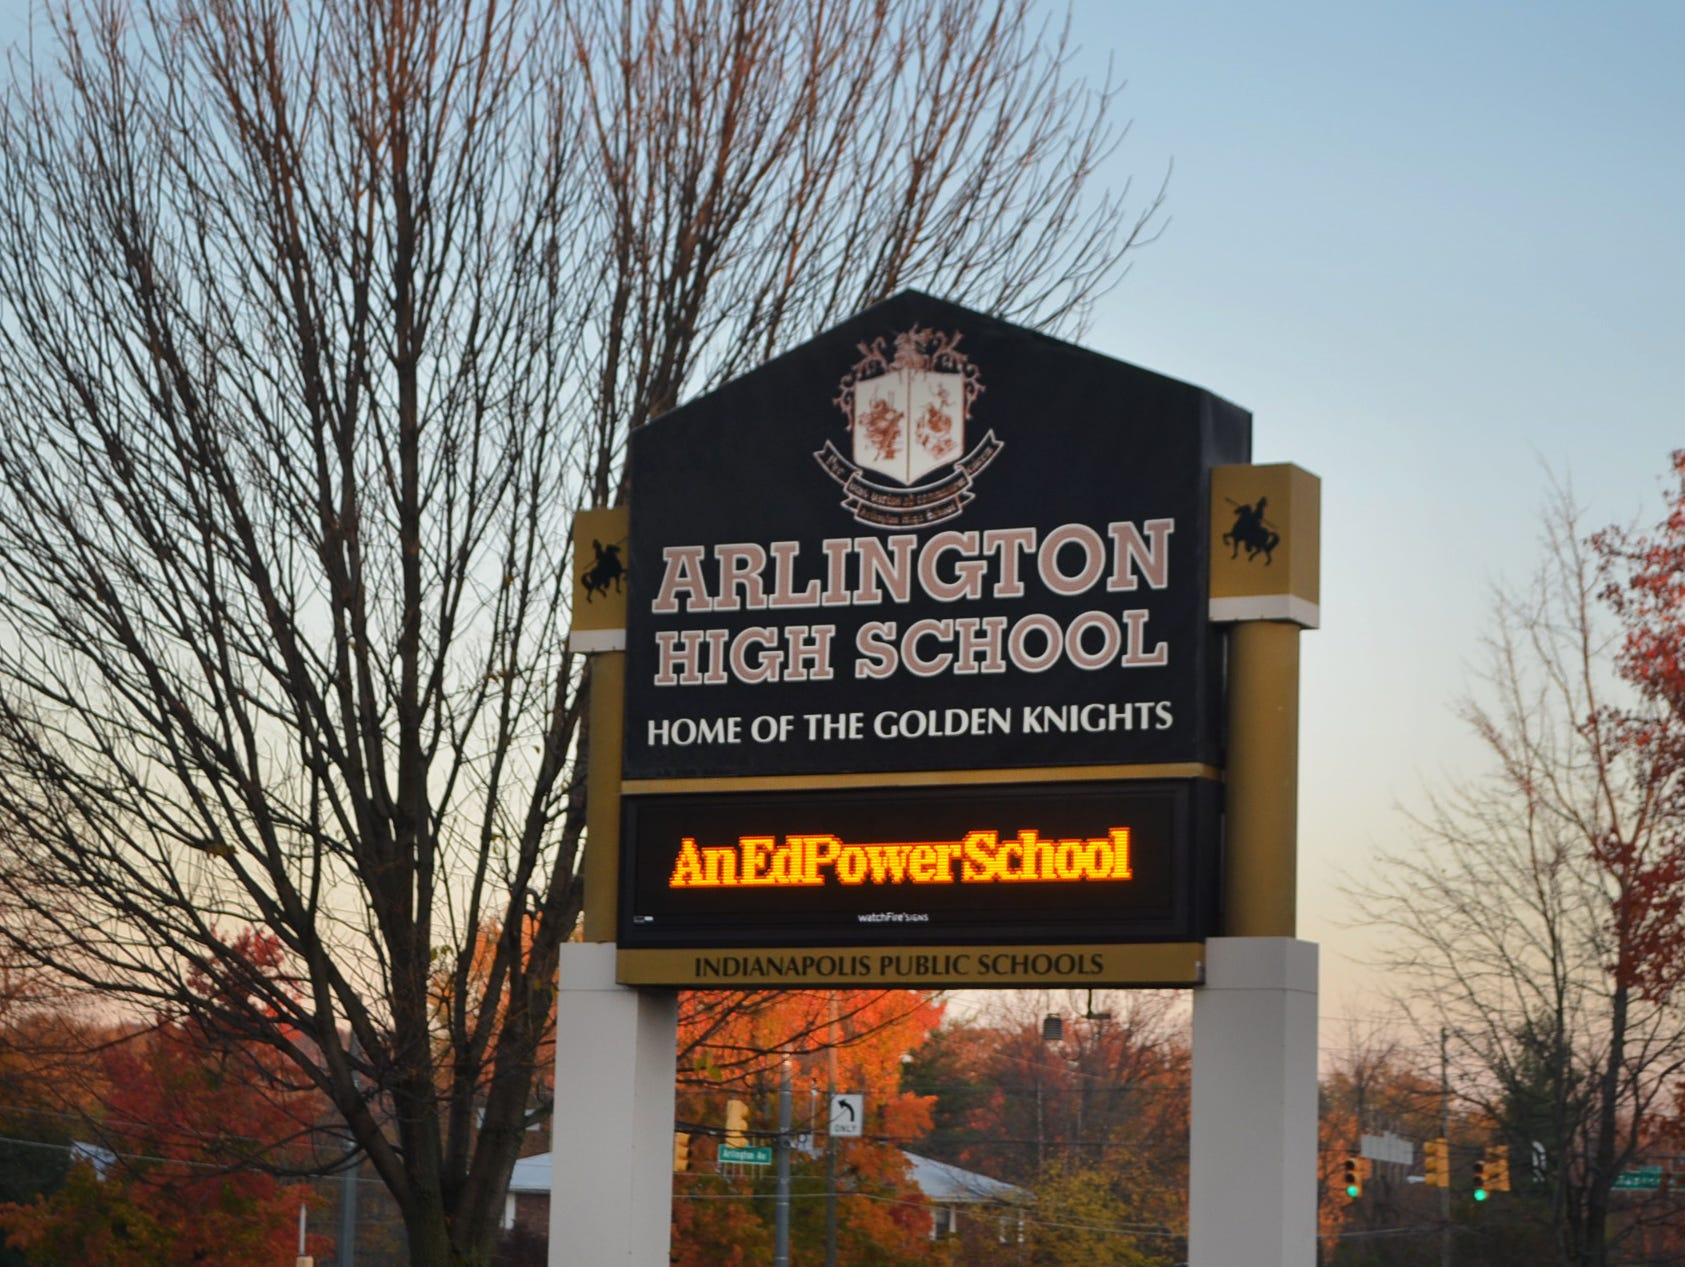 Arlington High School.